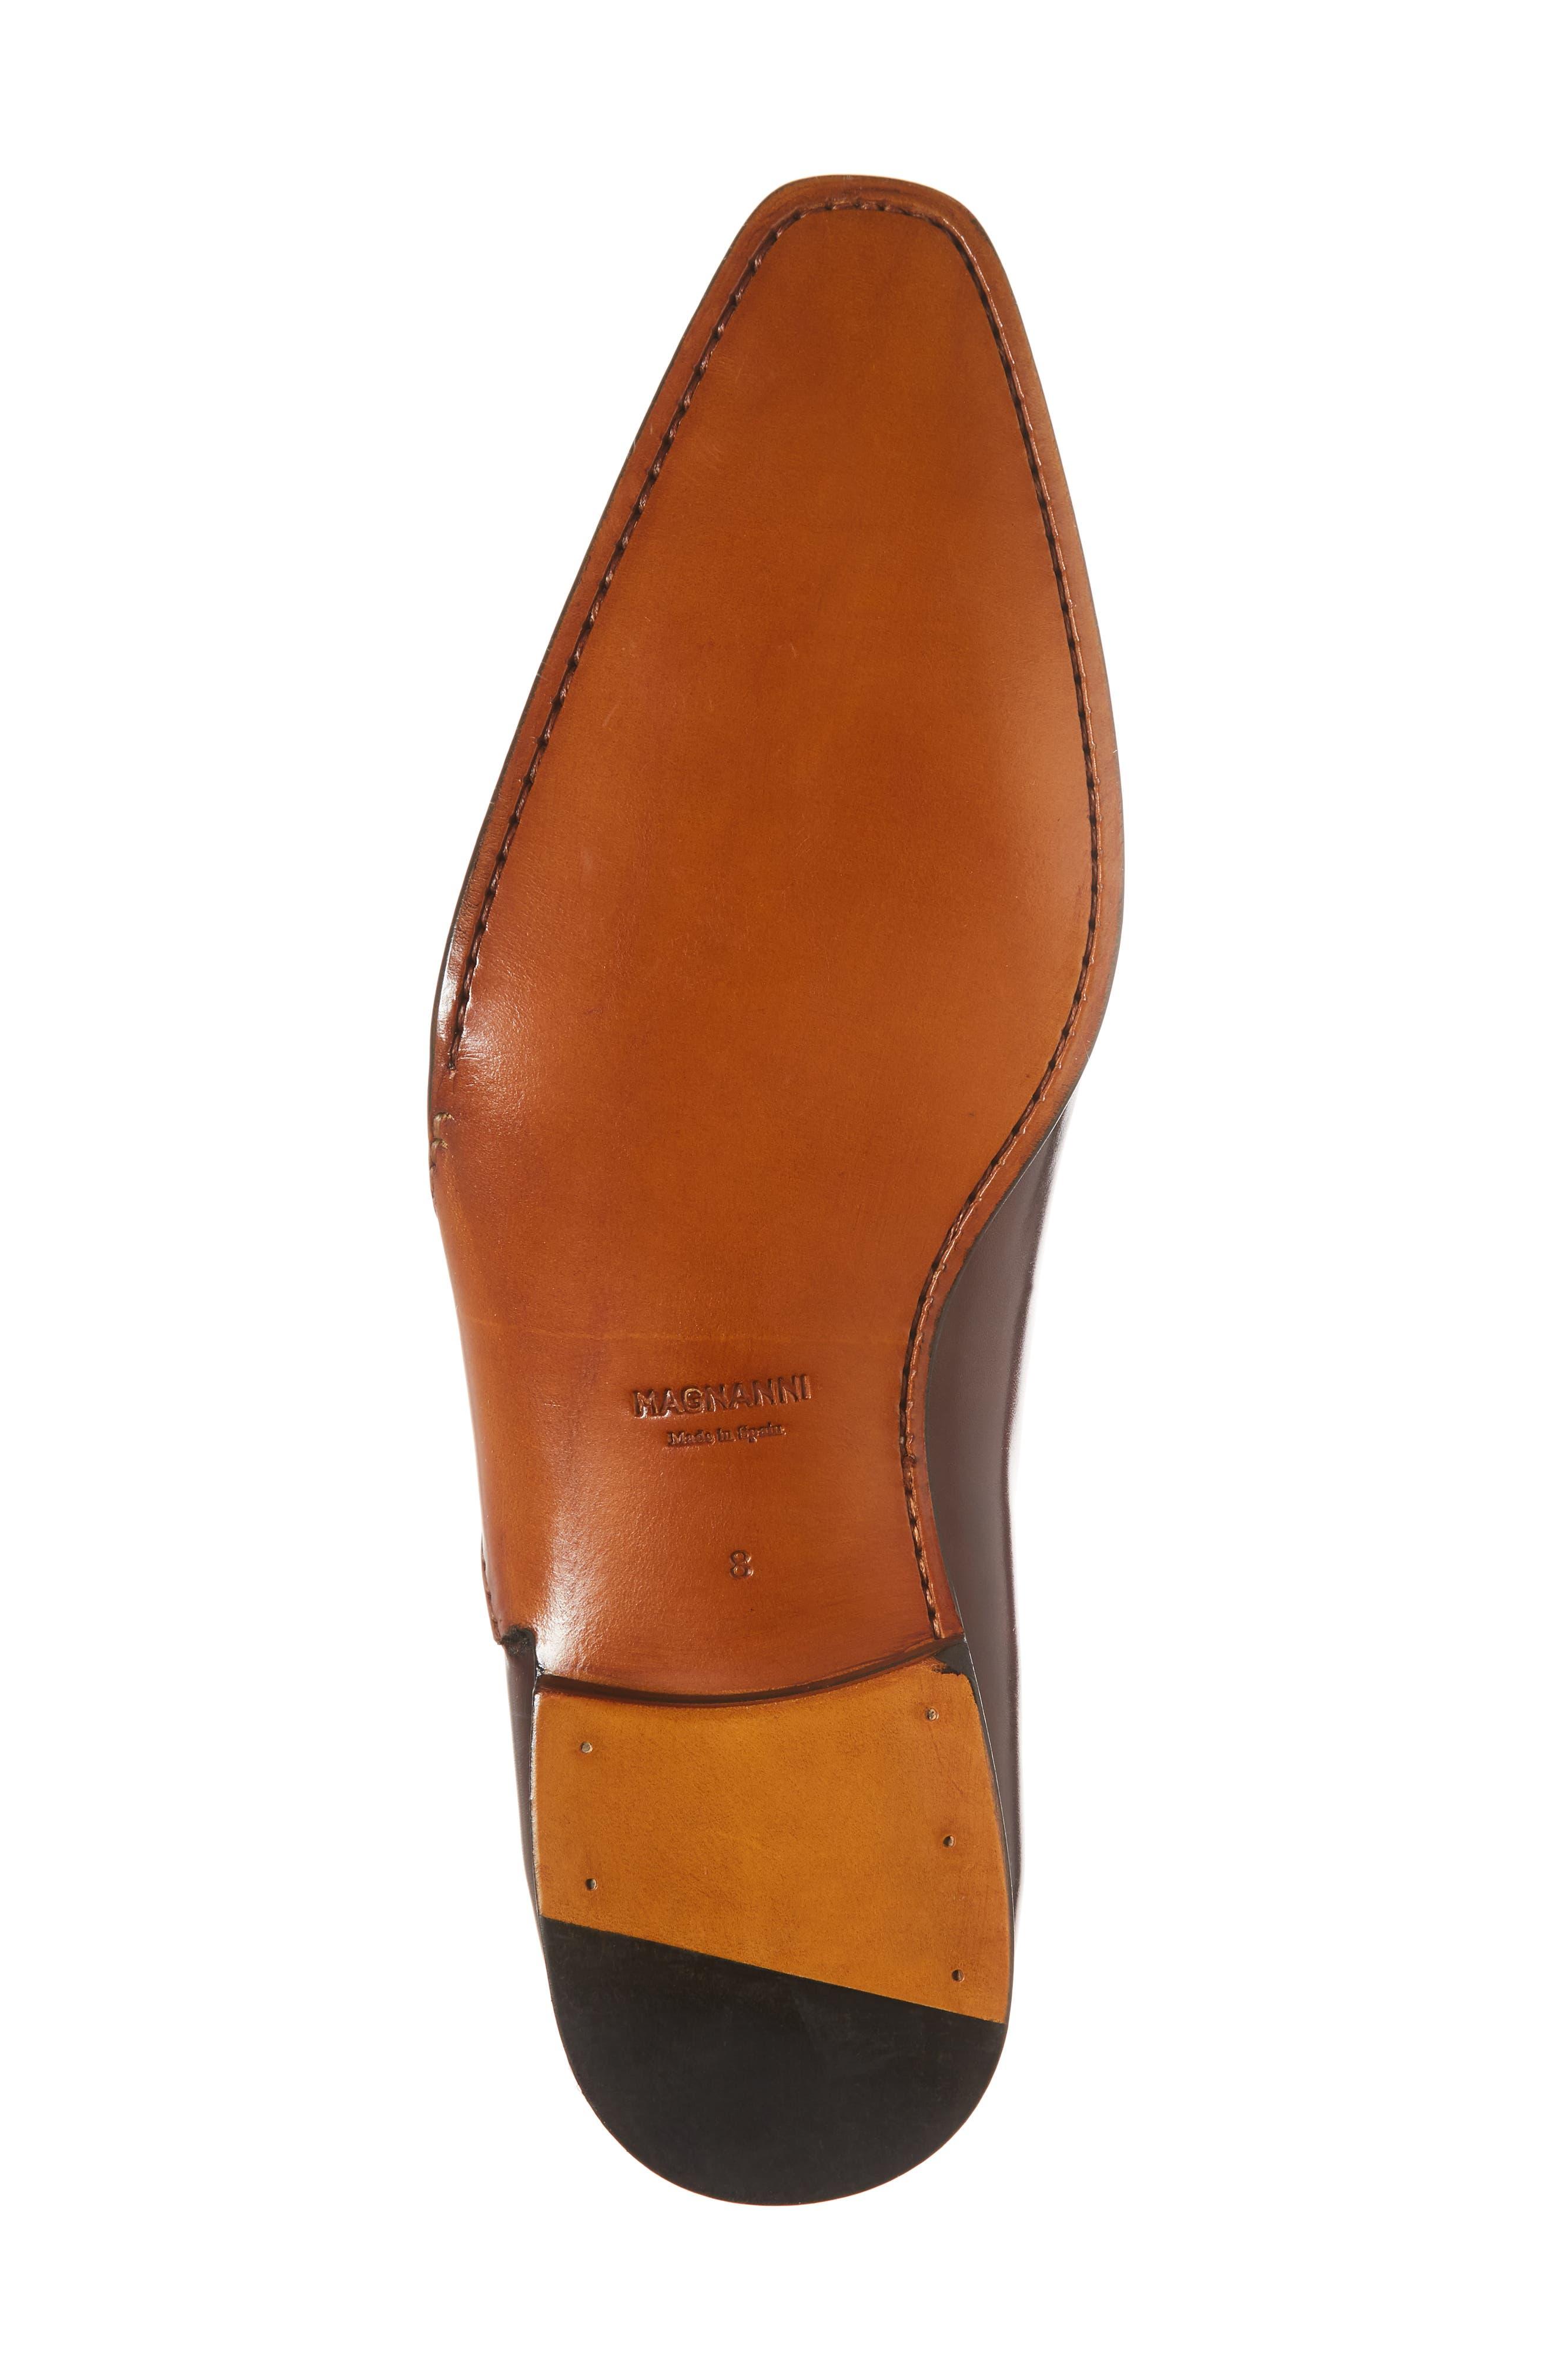 Vada Brogued Whole Cut Shoe,                             Alternate thumbnail 6, color,                             600